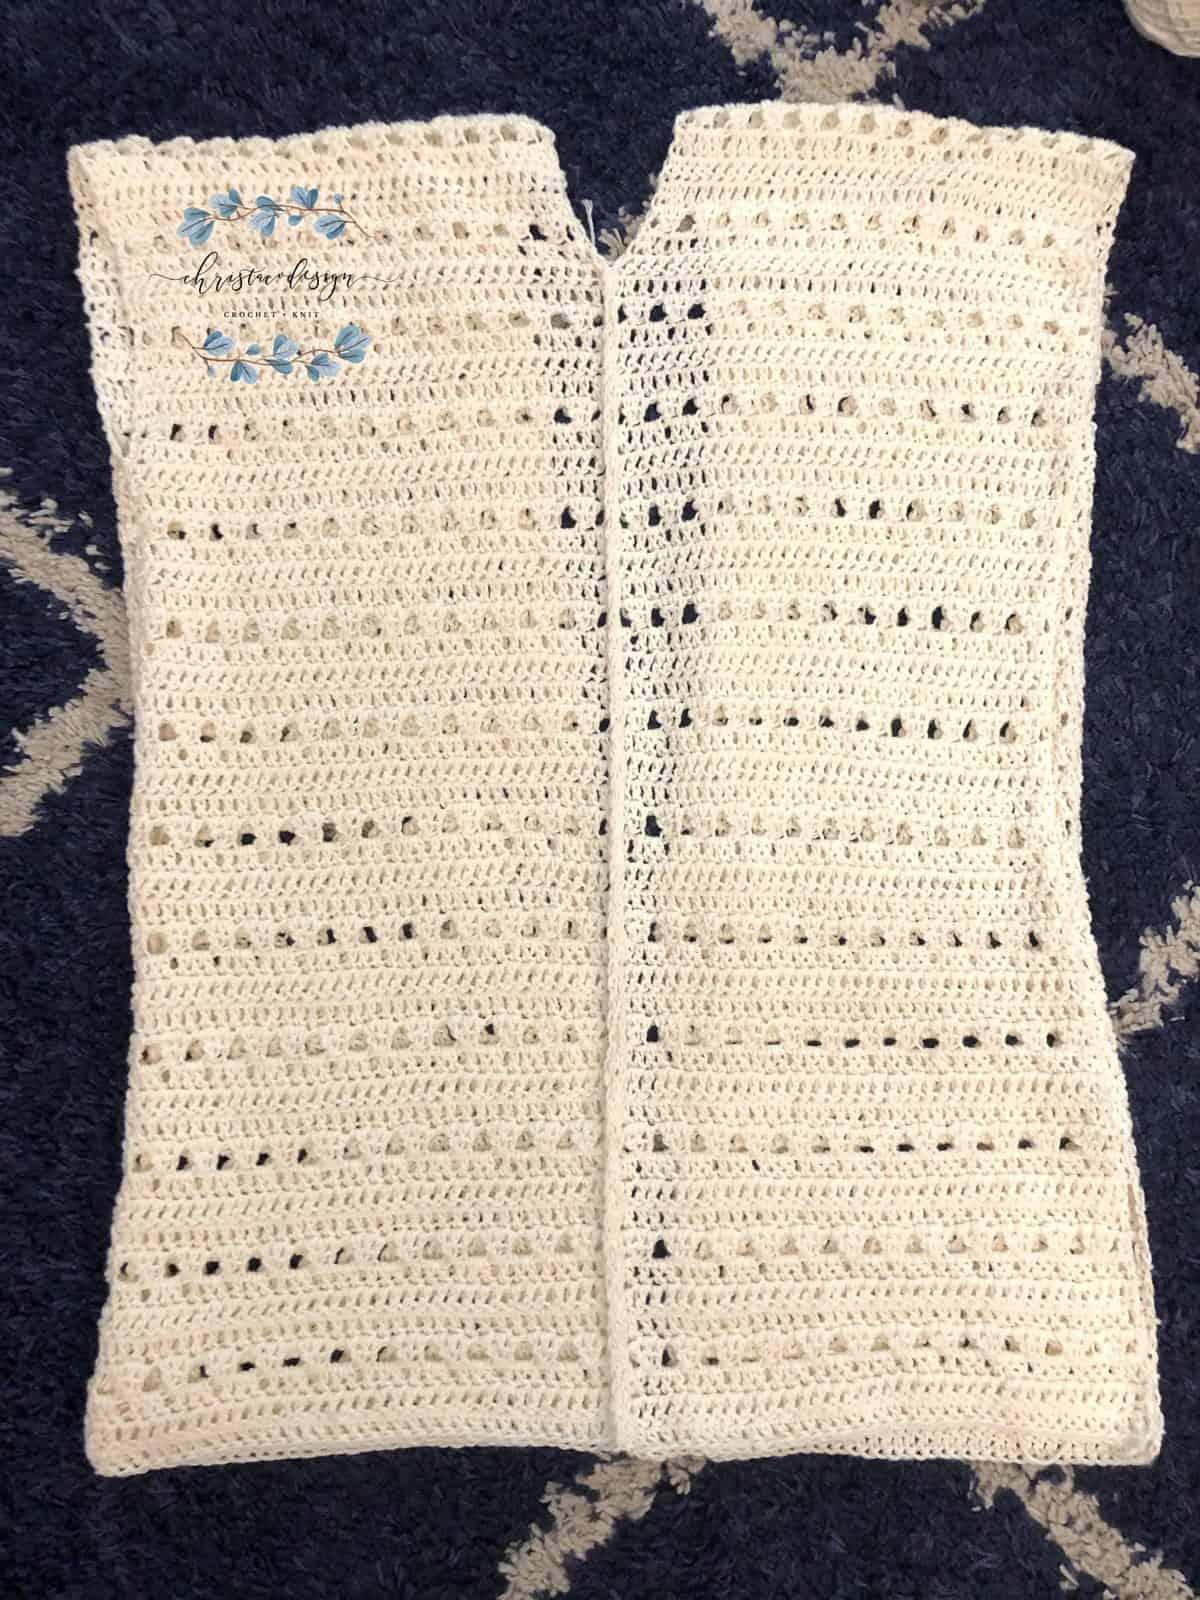 Picture of crochet cardigan back seam